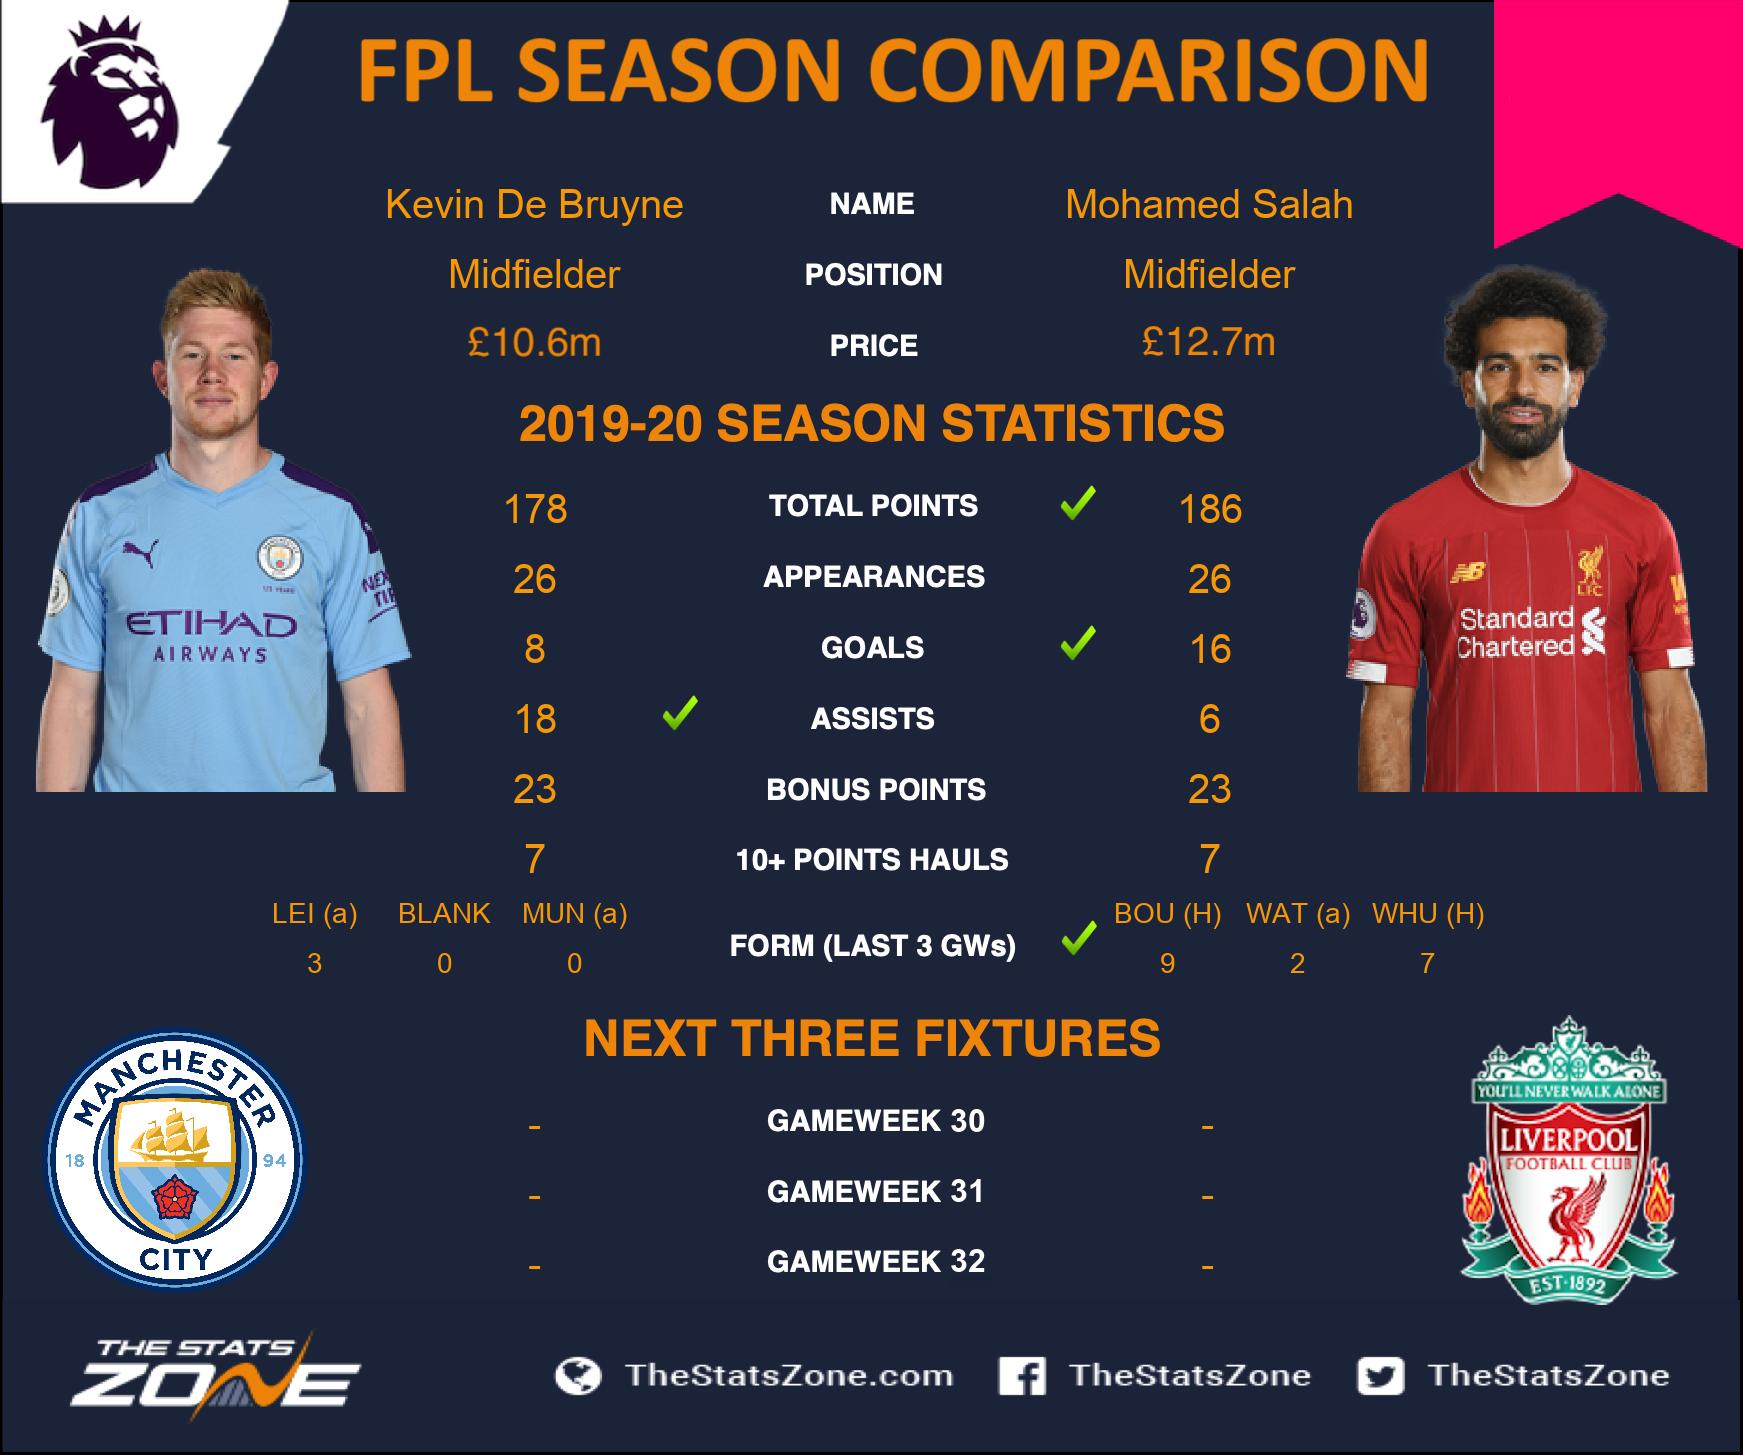 FPL season comparisons - Kevin De Bruyne vs Mo Salah - The ...